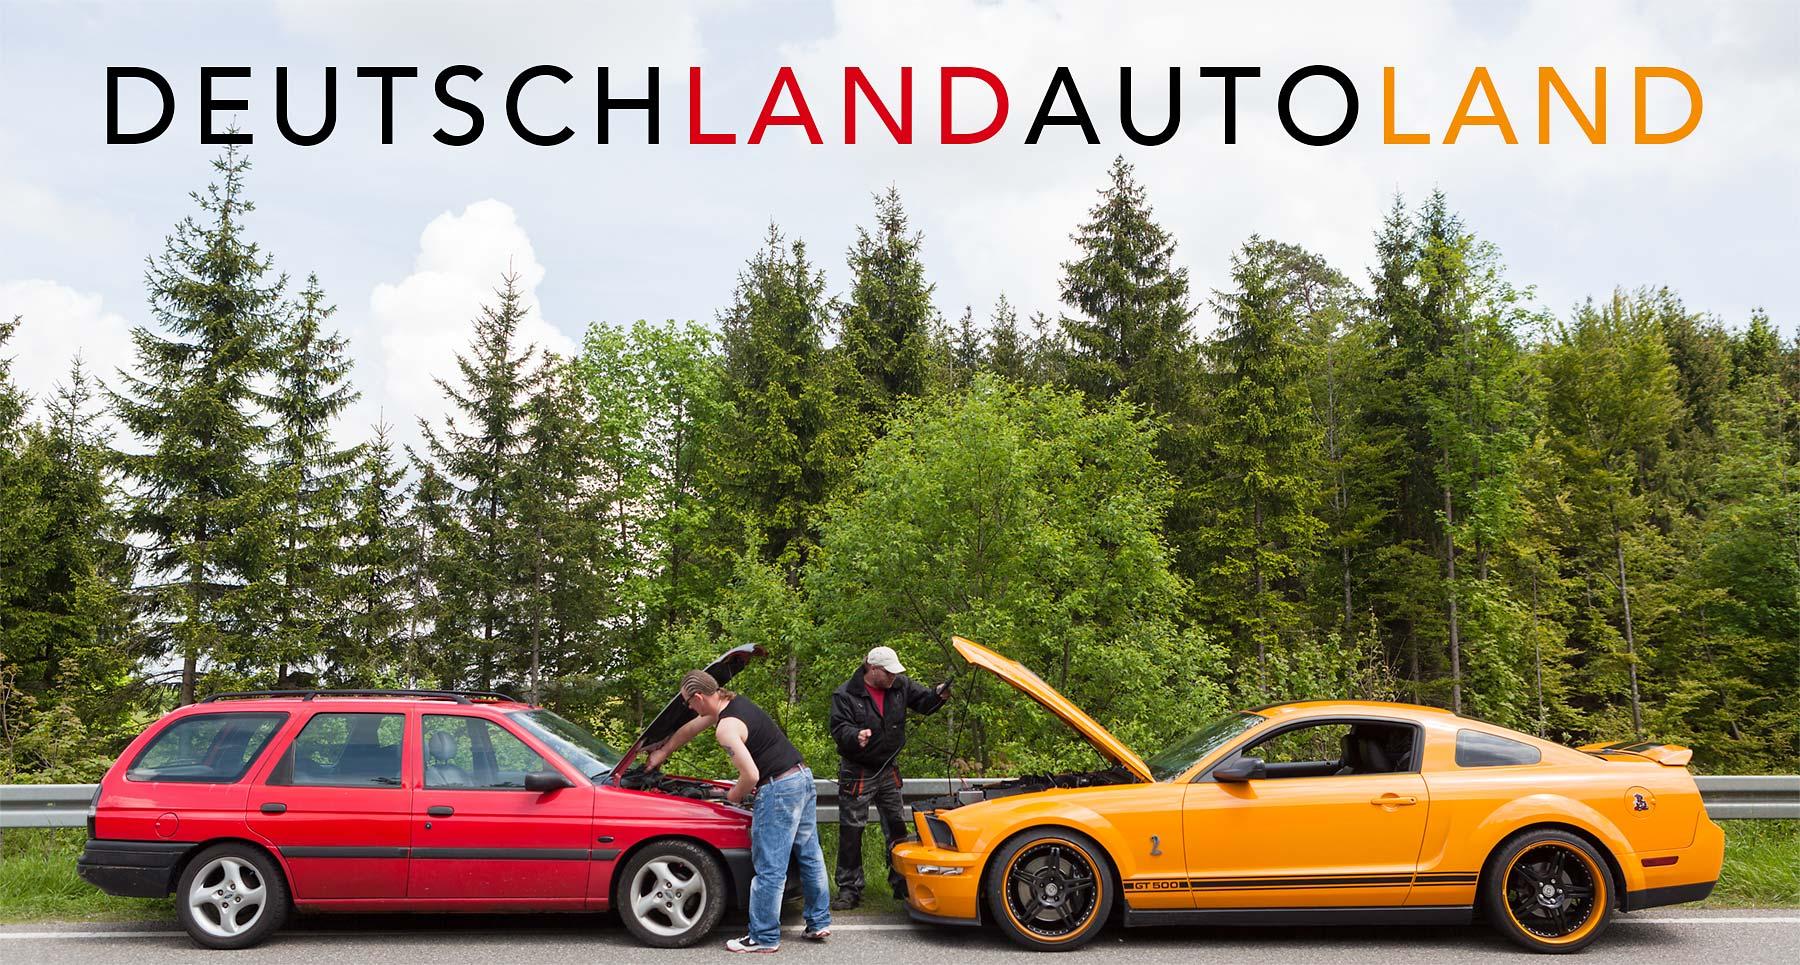 Autoland_featued_01